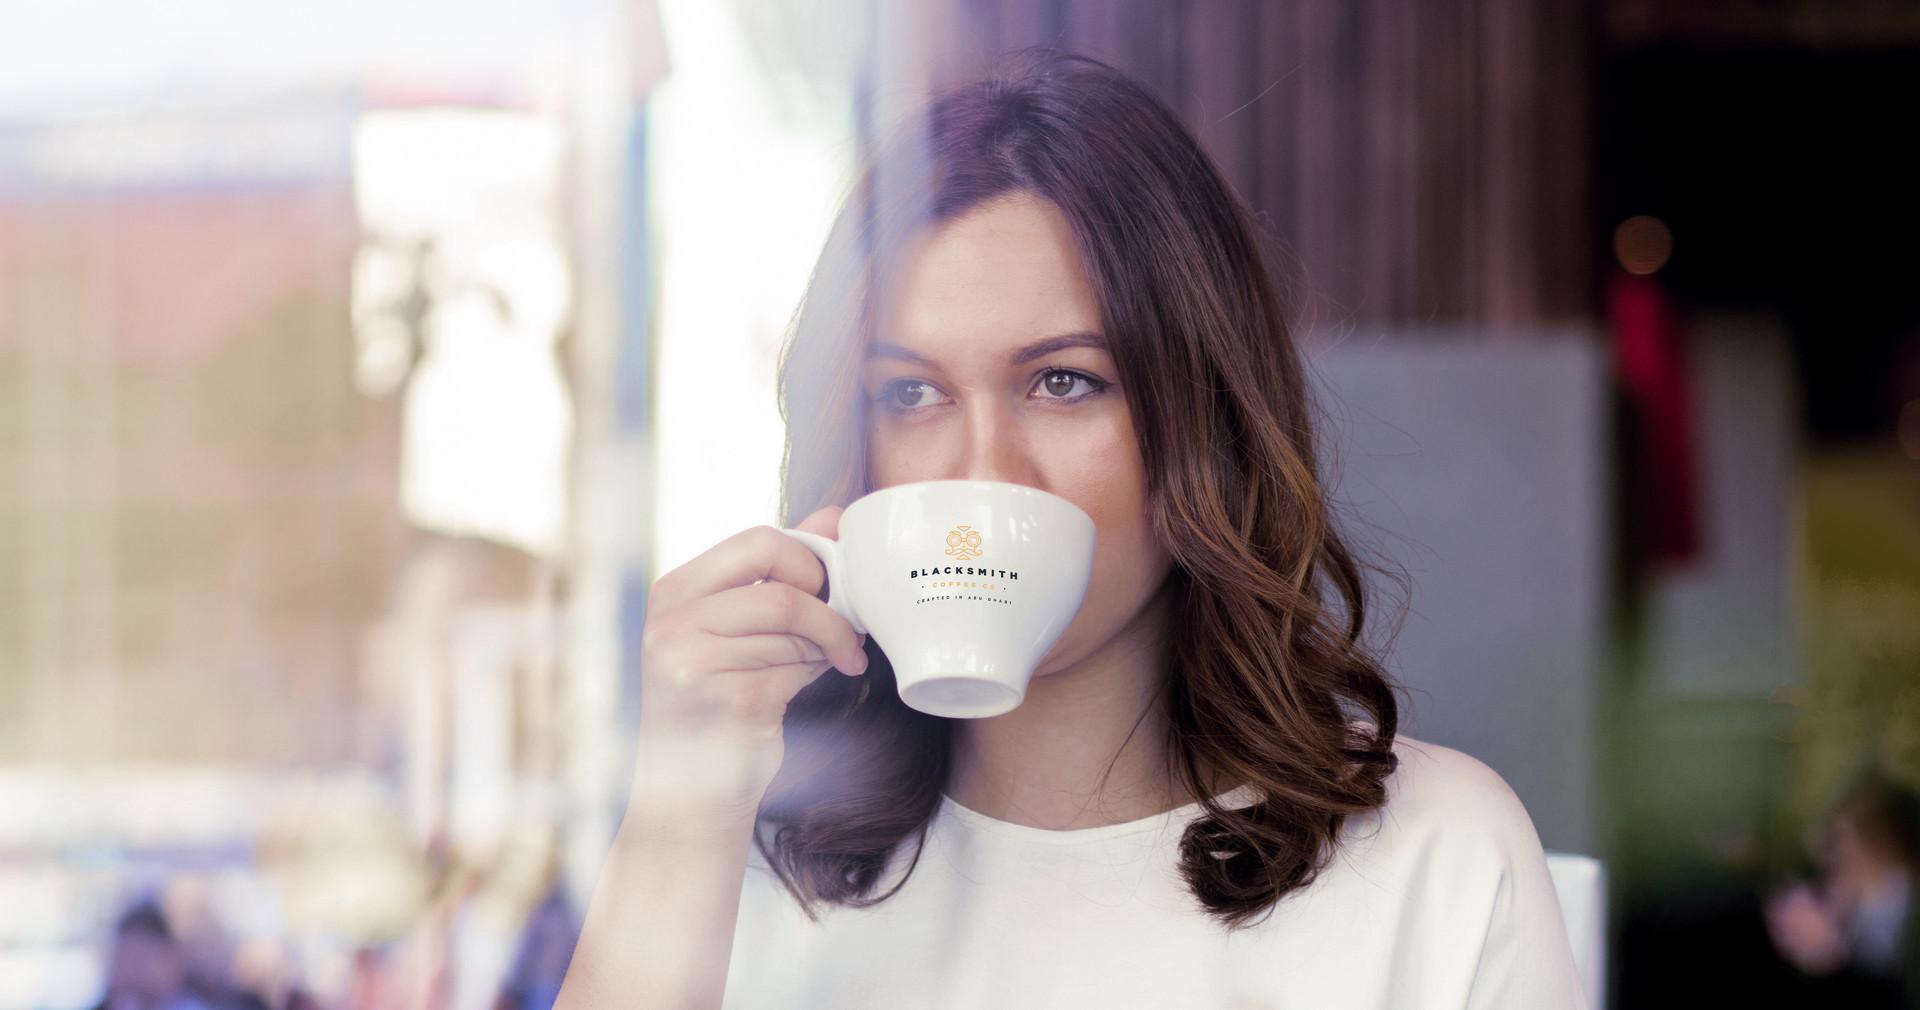 blacksmith-coffee-woman drinking.jpg